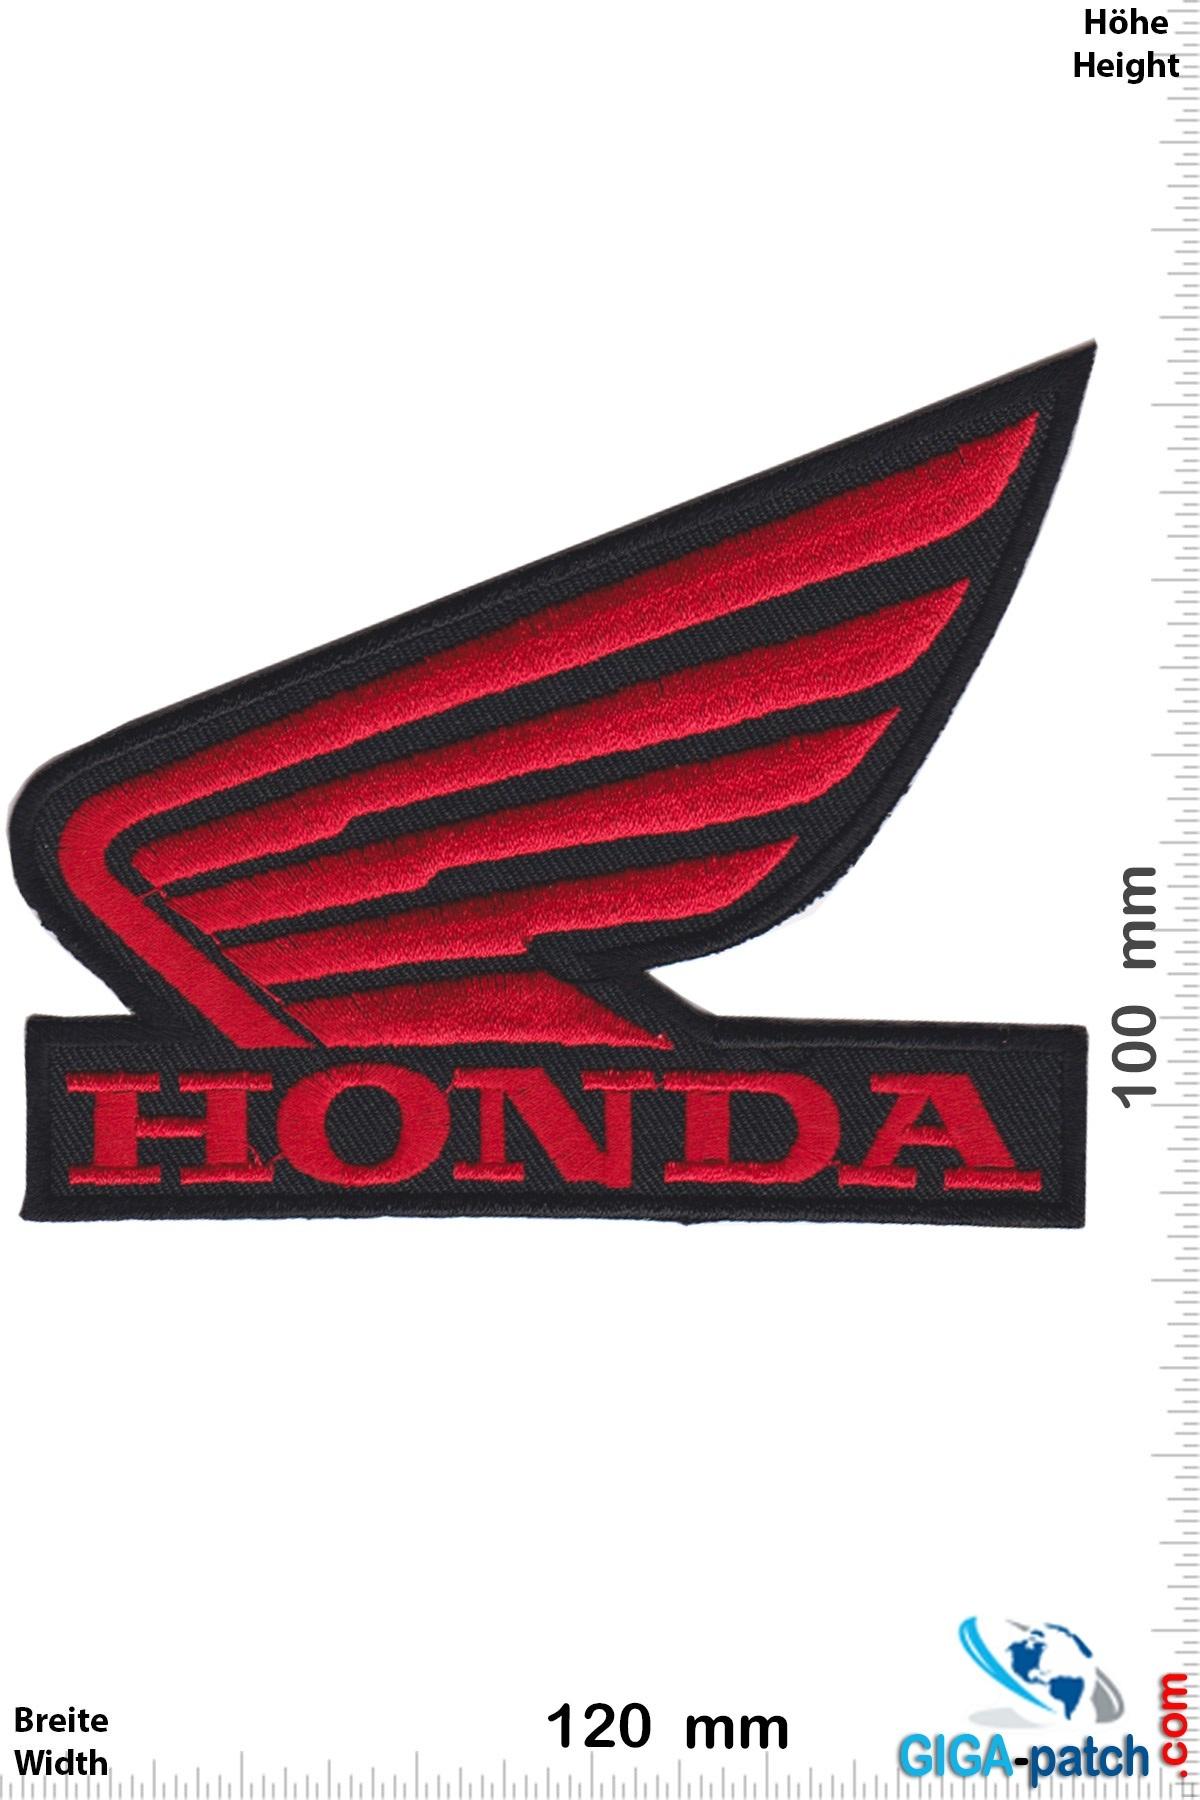 Honda Honda - Wing - red black - big